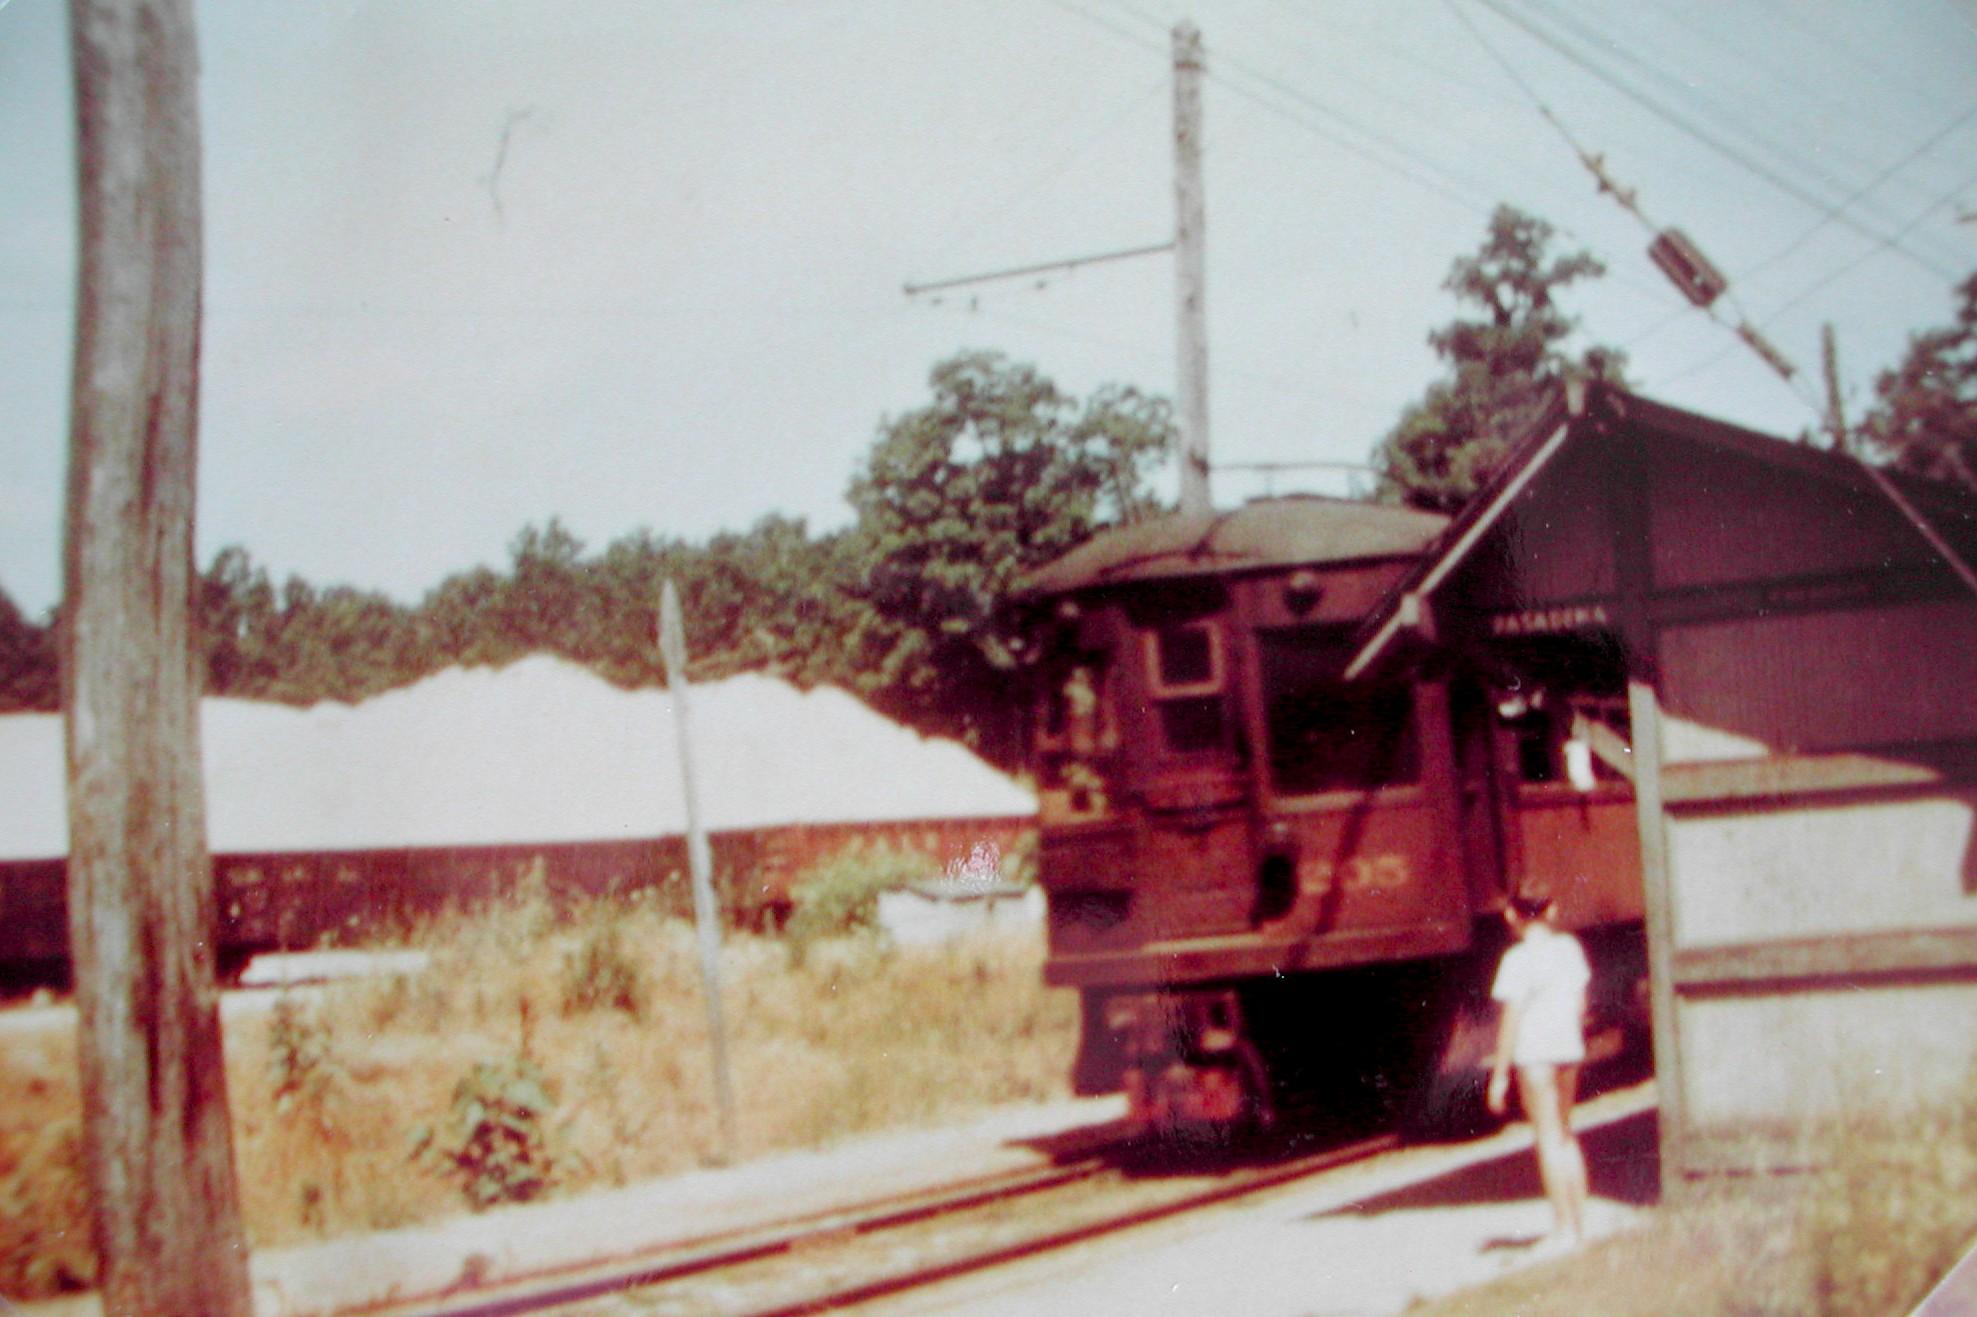 Baltimore & Annapolis Railroad Car #205 at Pasadena Station. Pasadena, Maryland Date: 1947. Source: Unkown